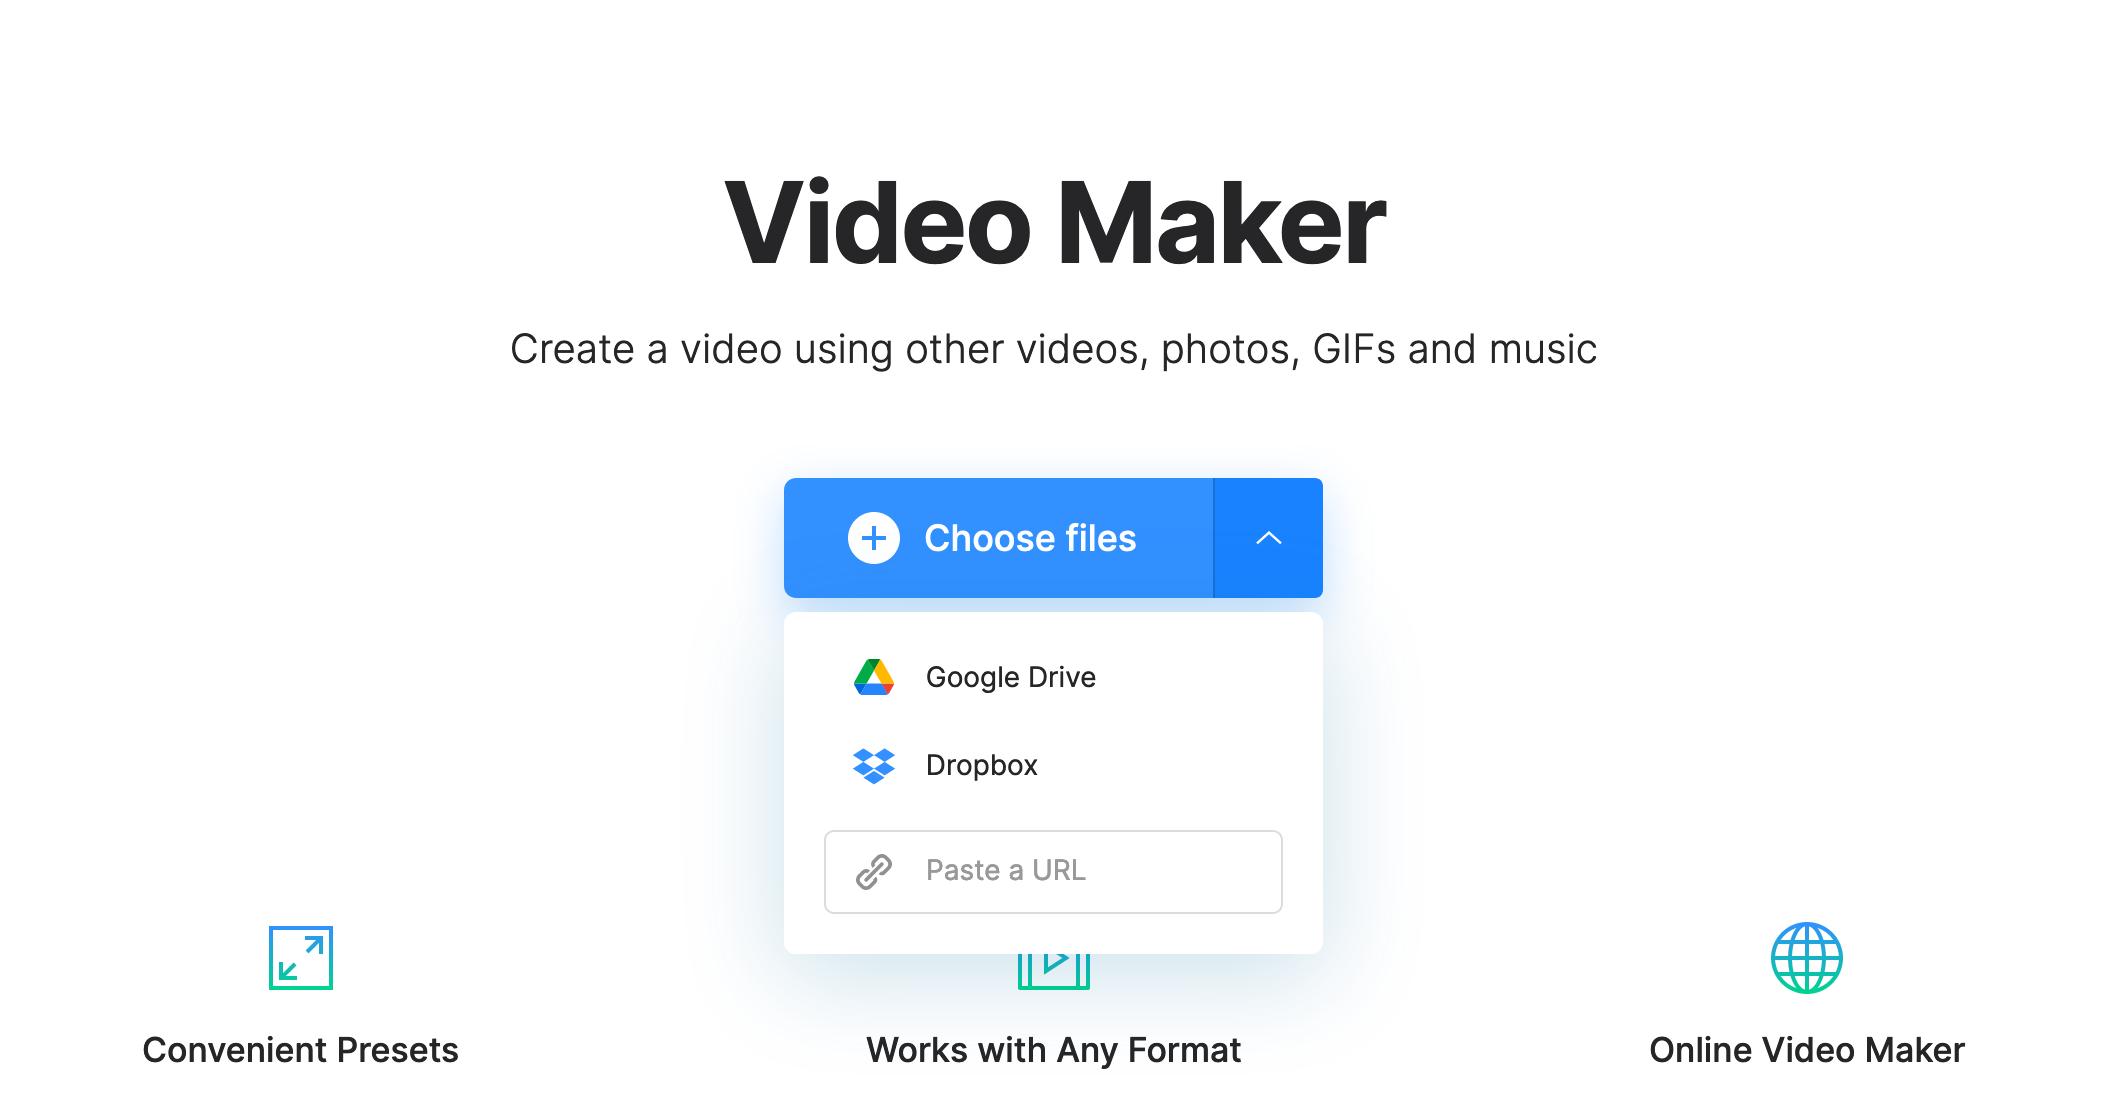 Upload GIF to add audio